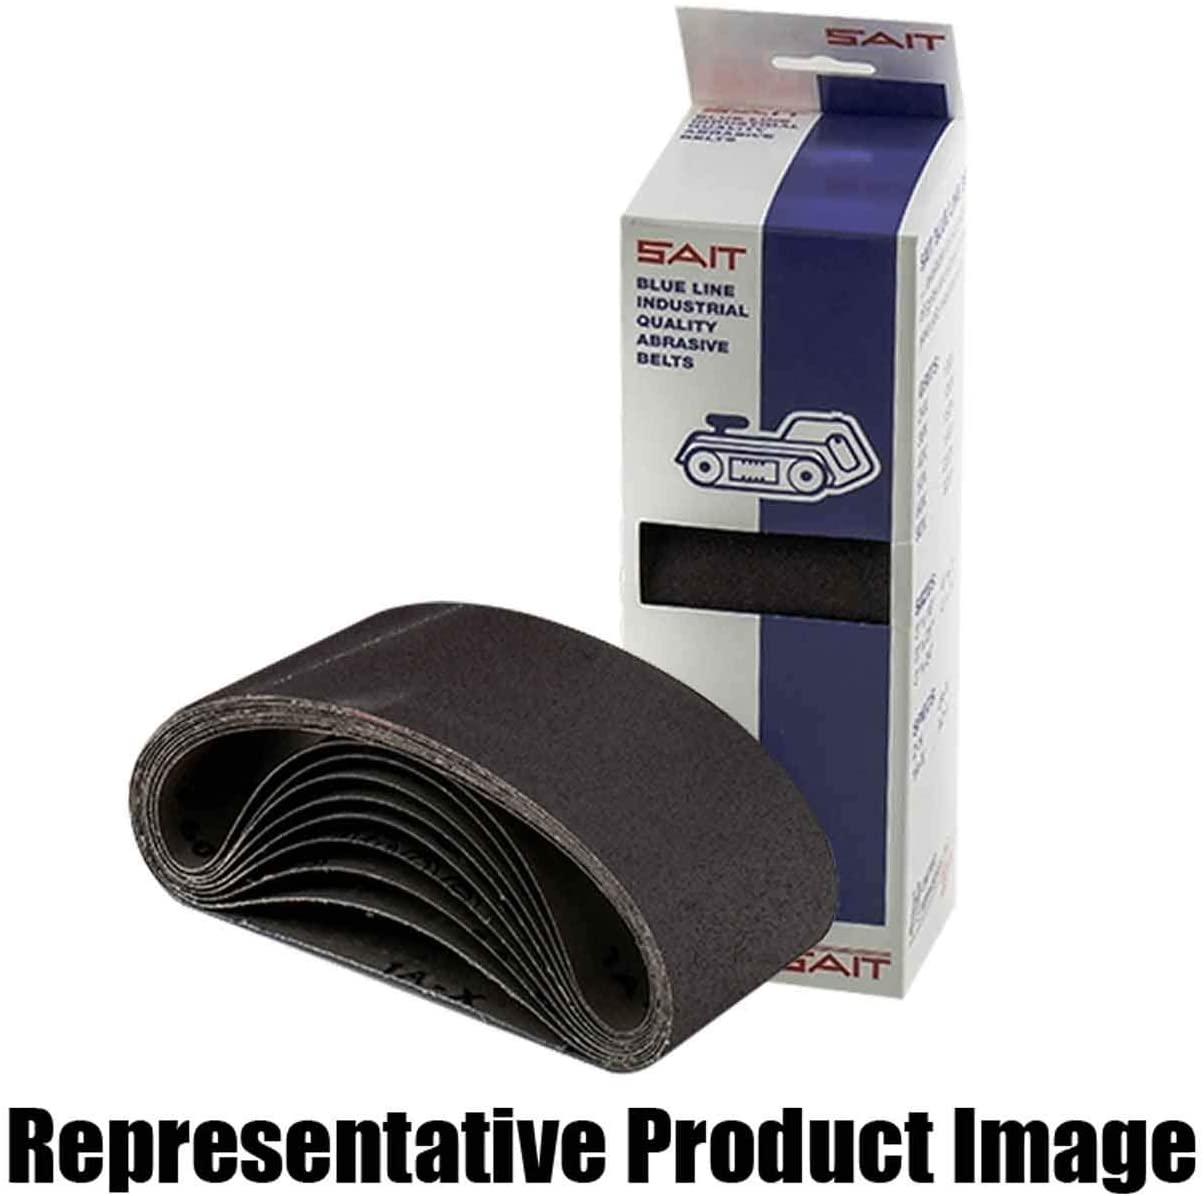 United Abrasives SAIT 57509 3x24 Blue Line 1A-X Aluminum Oxide Portable Sander Belt, 180 Grit, 10 pack